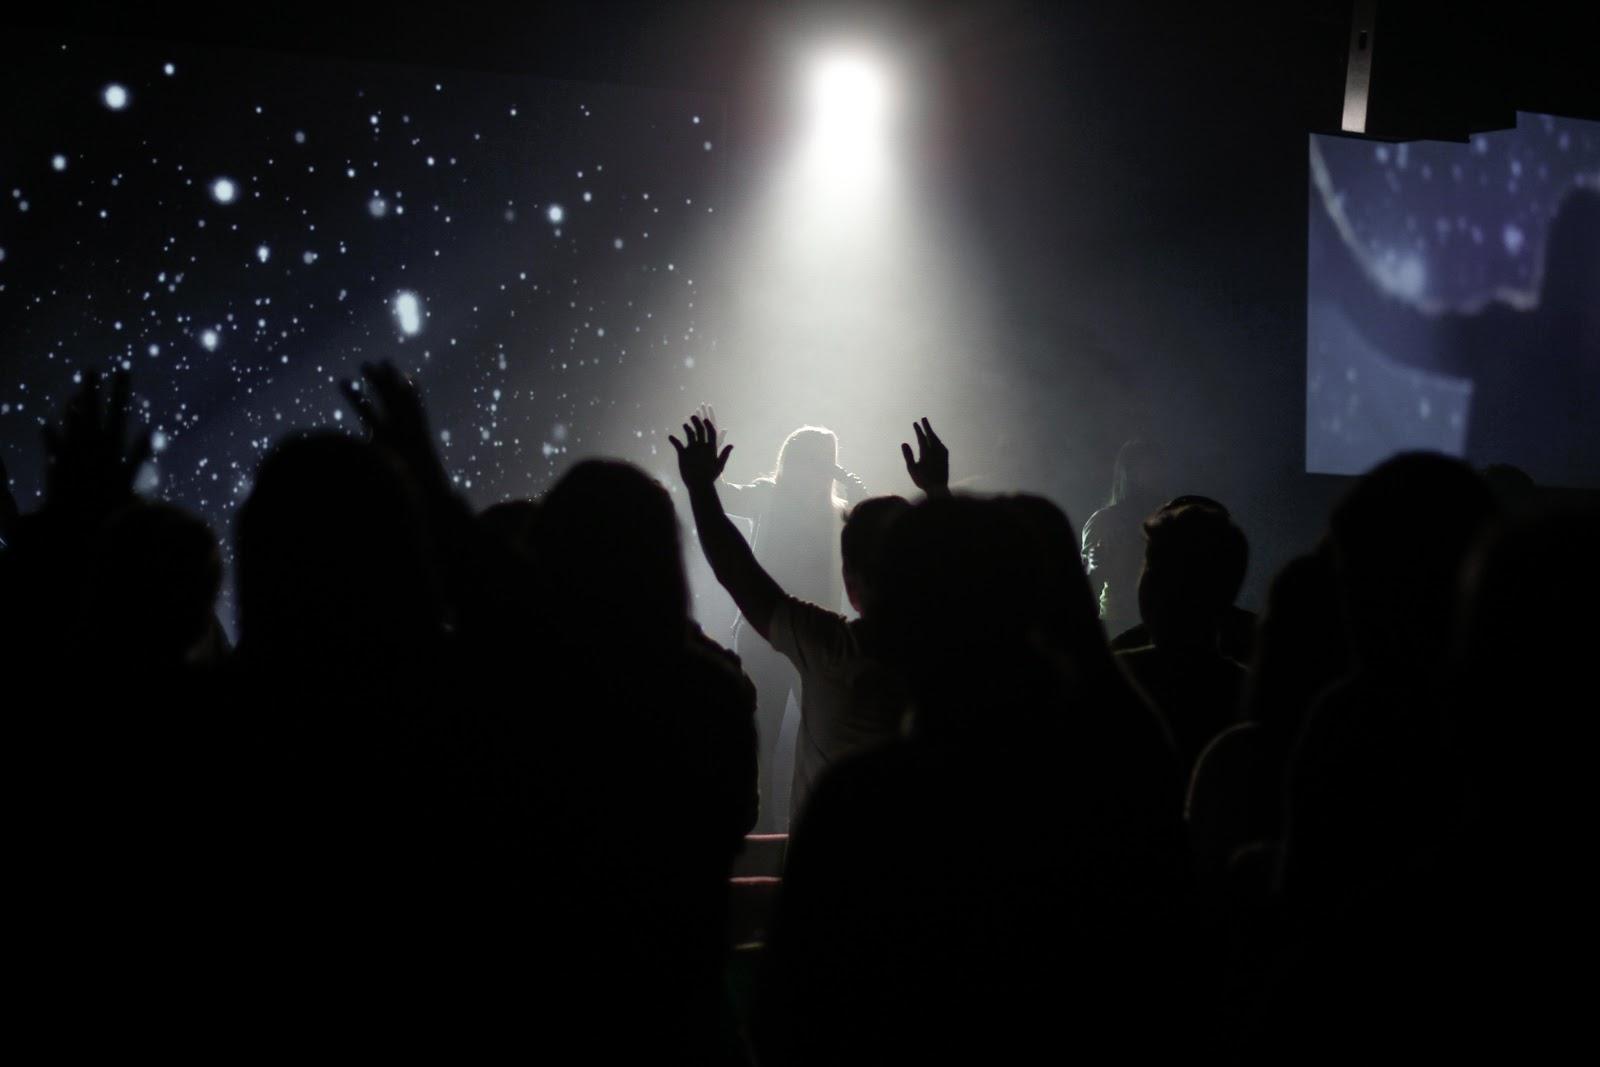 Concert  with spotlight on singer